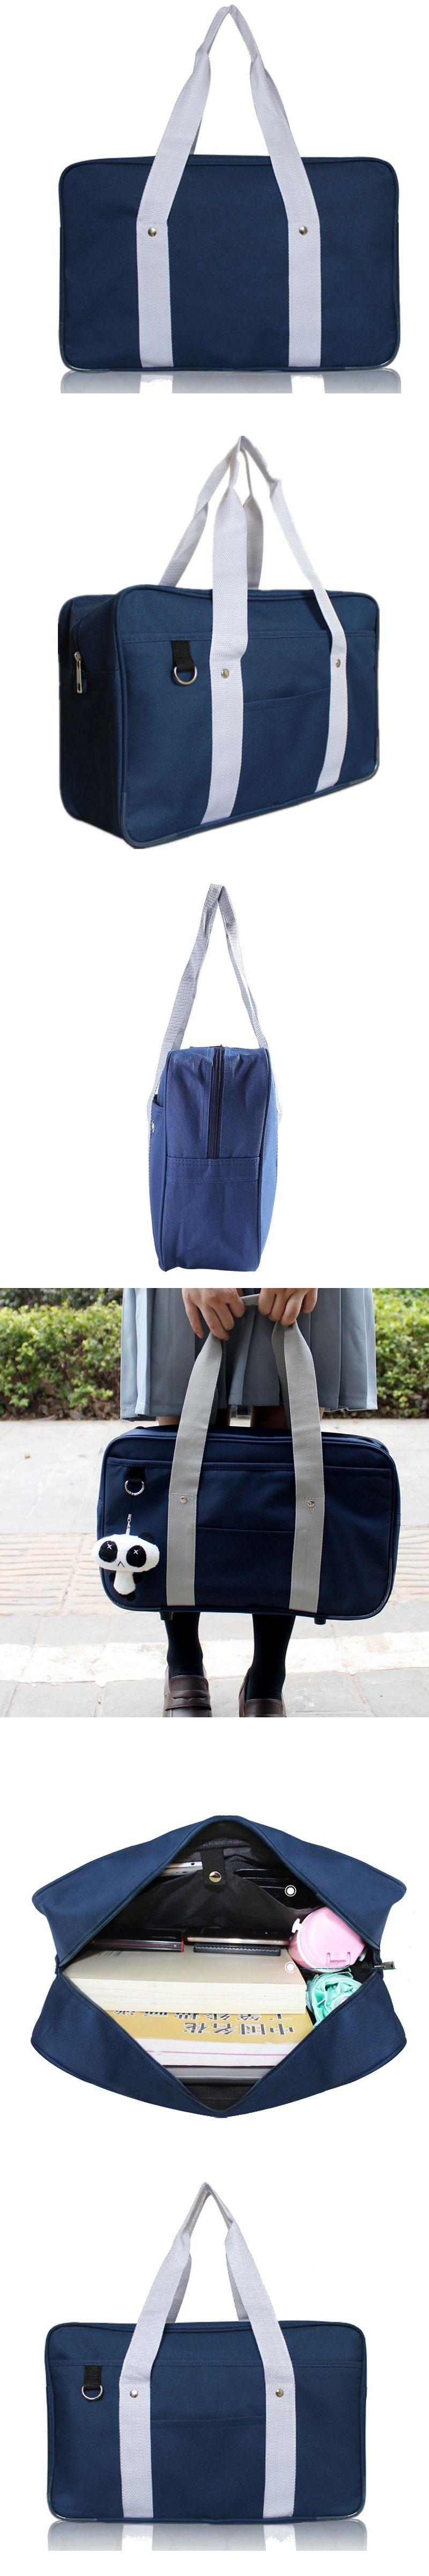 1553adbf3545 Japanese School Bags Large Capacity Portable Handbags Shoulder Bag For Youth  Girls and Boys High Quality